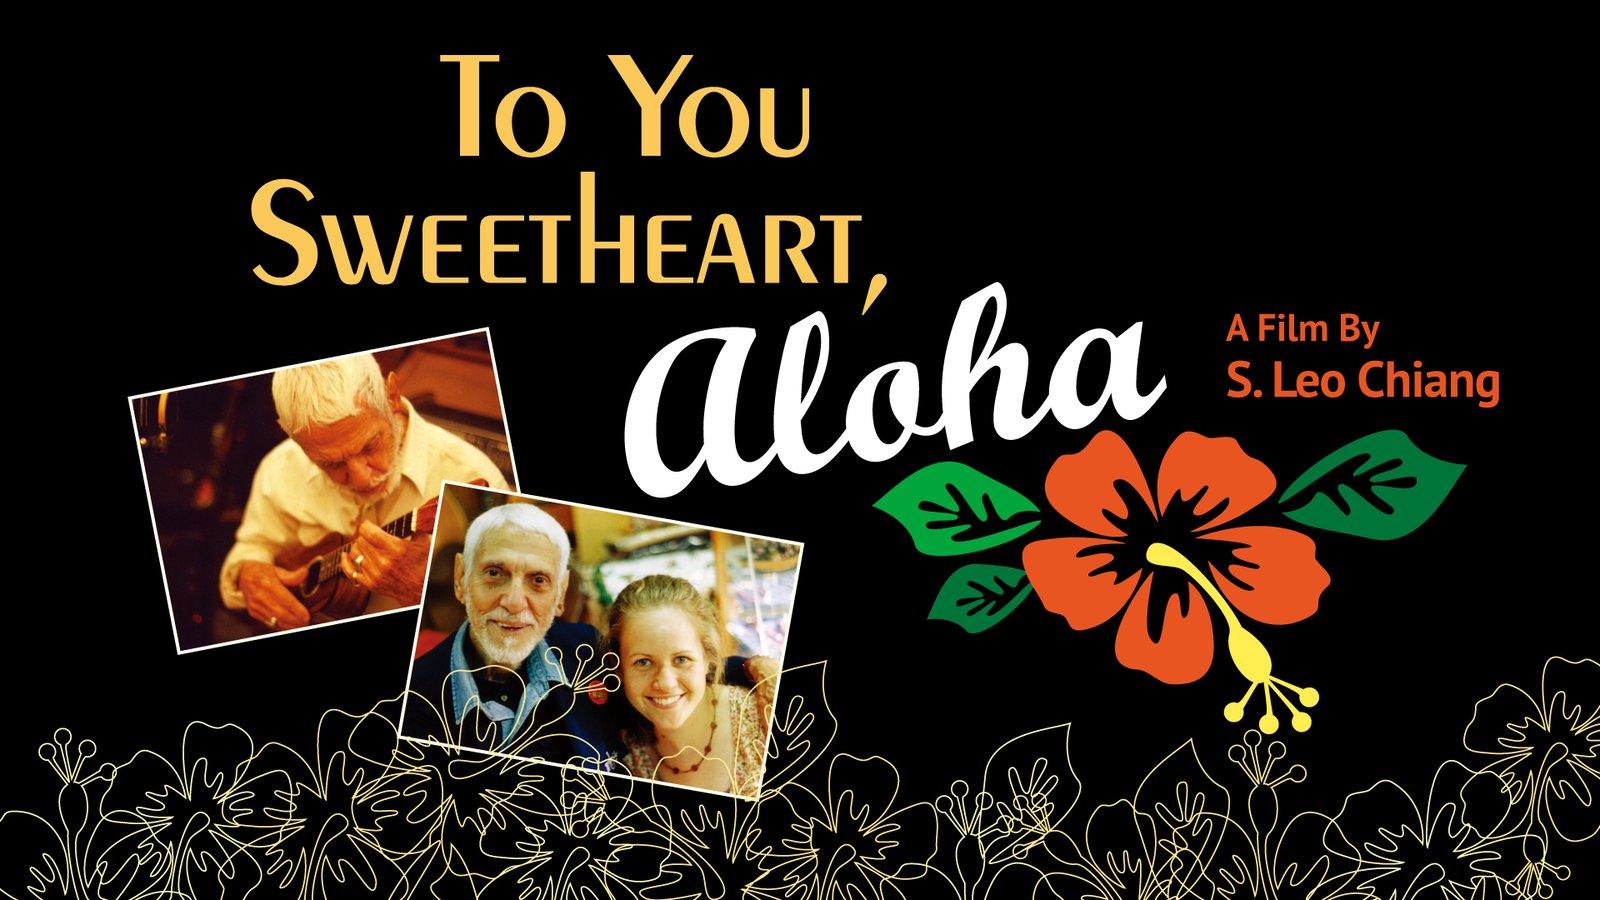 To You Sweetheart, Aloha